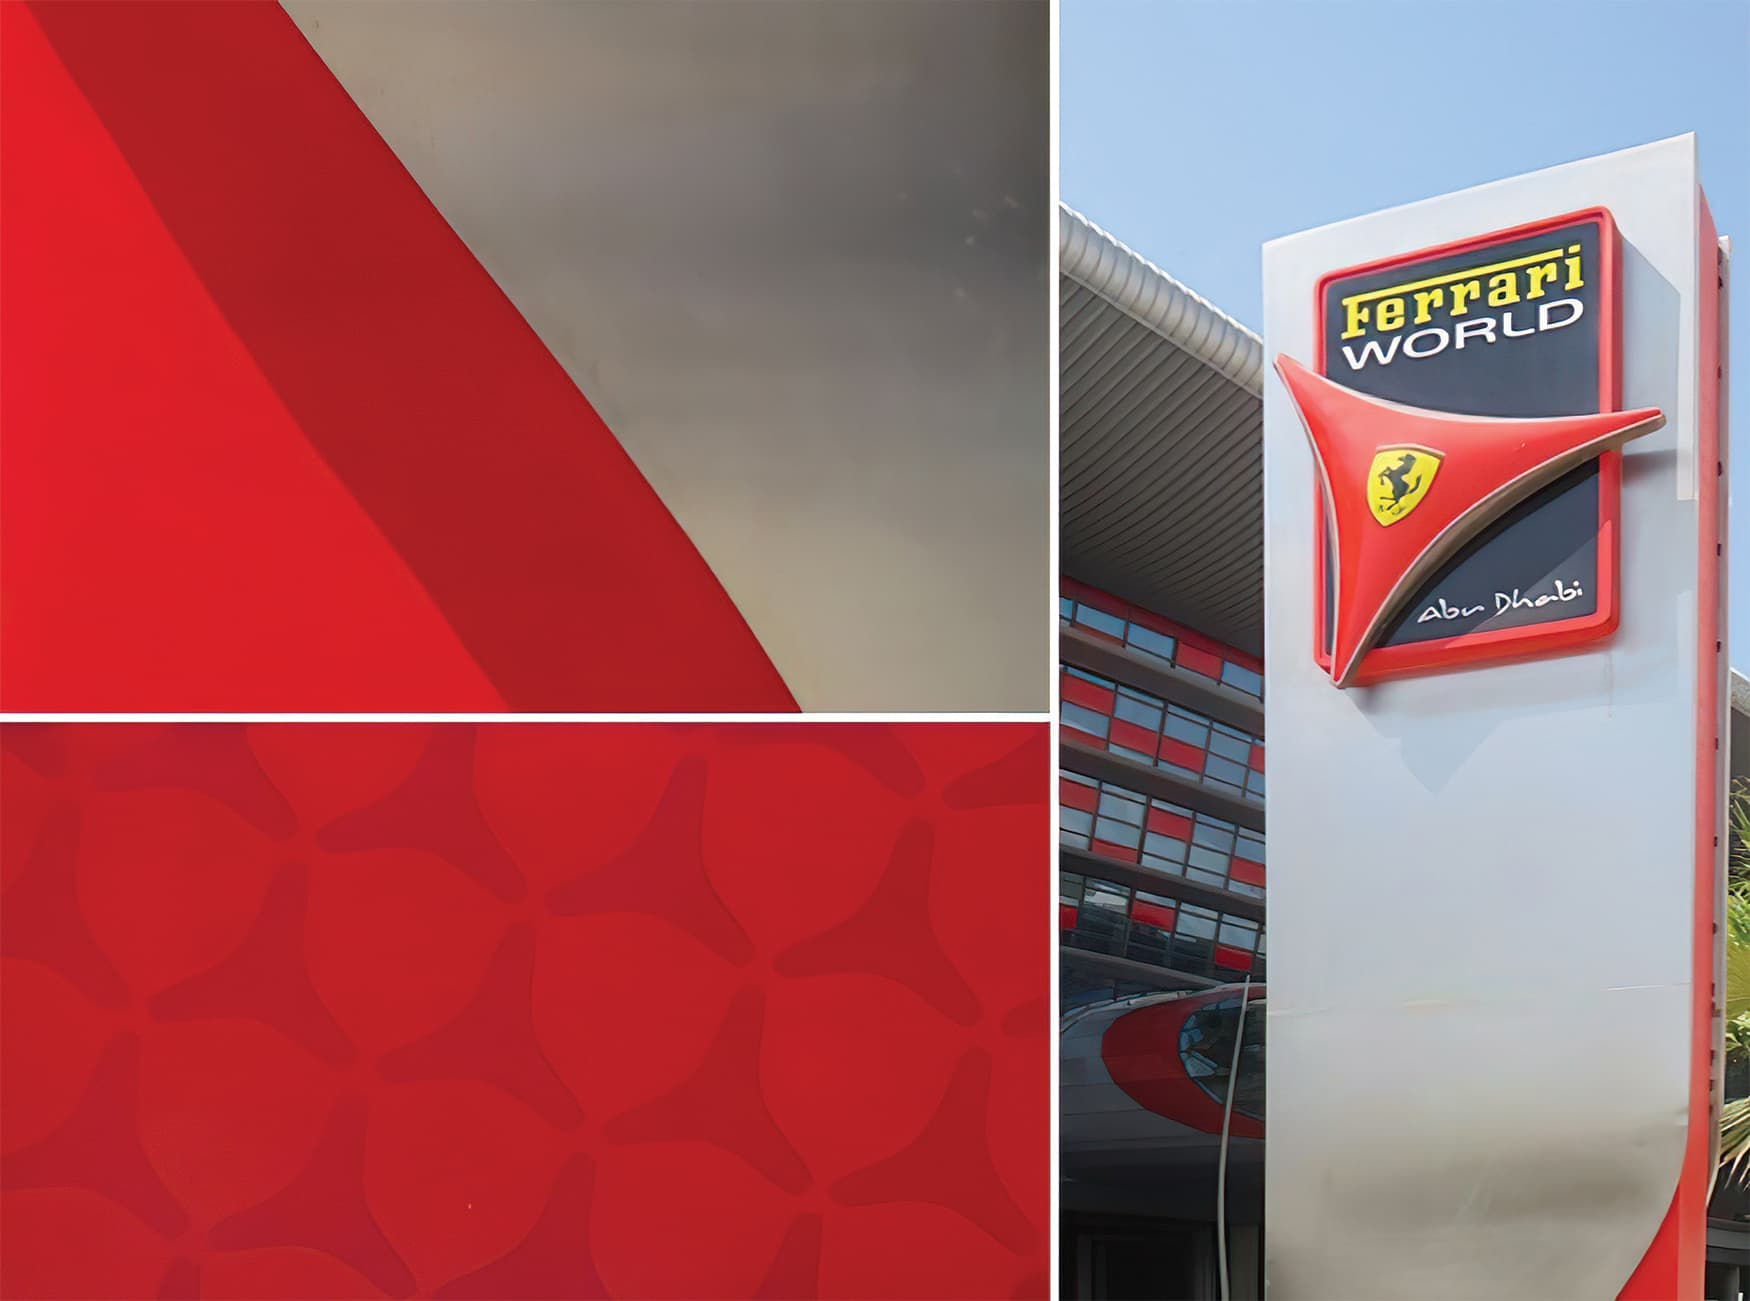 Ferrari World in Abu Dhabi in the United Arab Emirates. Project Identity Totem.